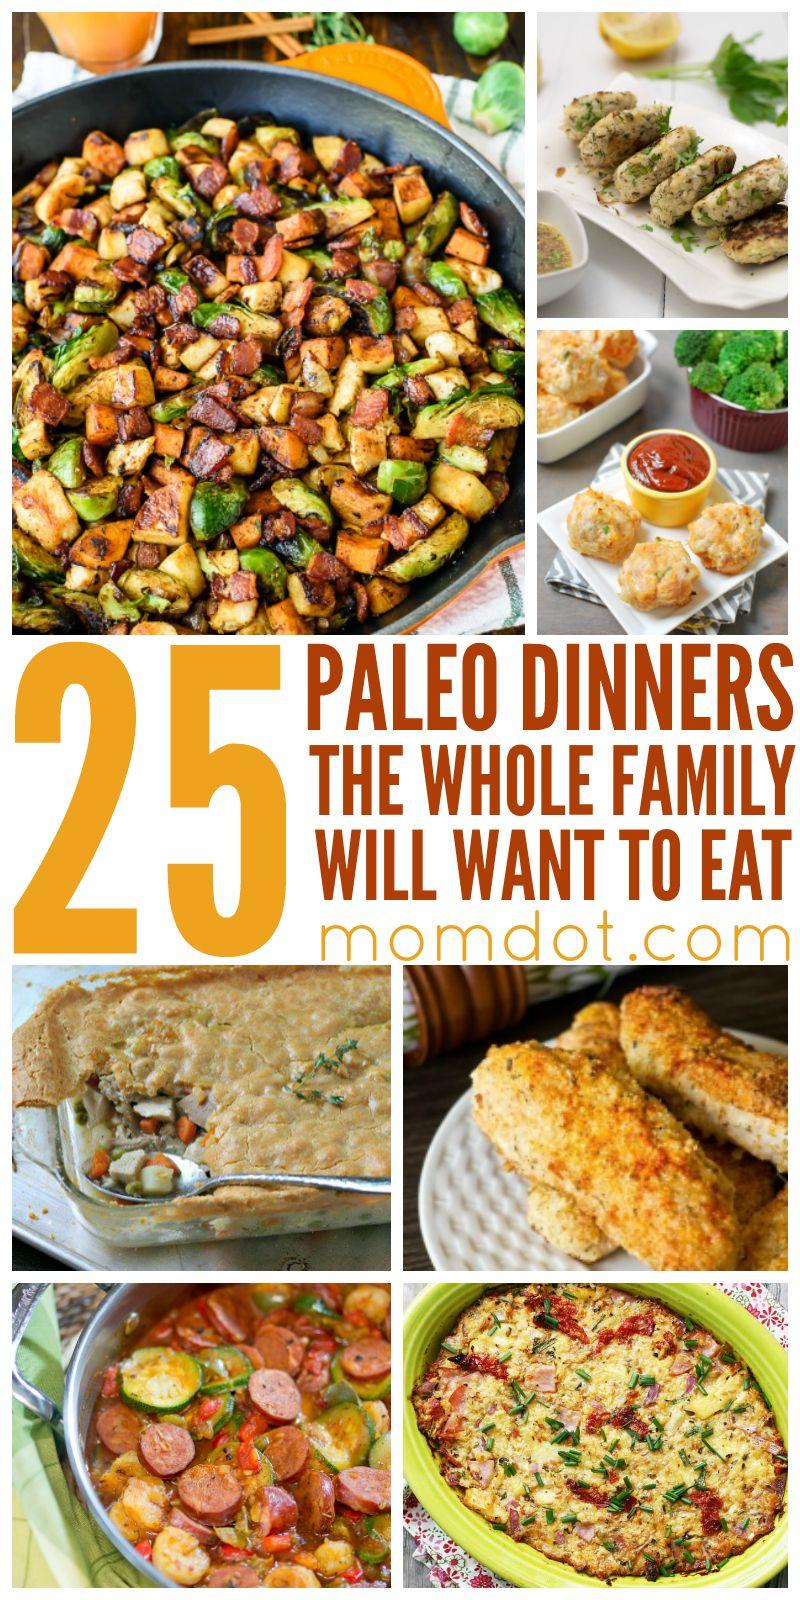 Paleo Dinner Recipes The Whole Family Will Love Paleo Recipes Dinner Easy Paleo Dinner Recipes Paleo Dinner Easy